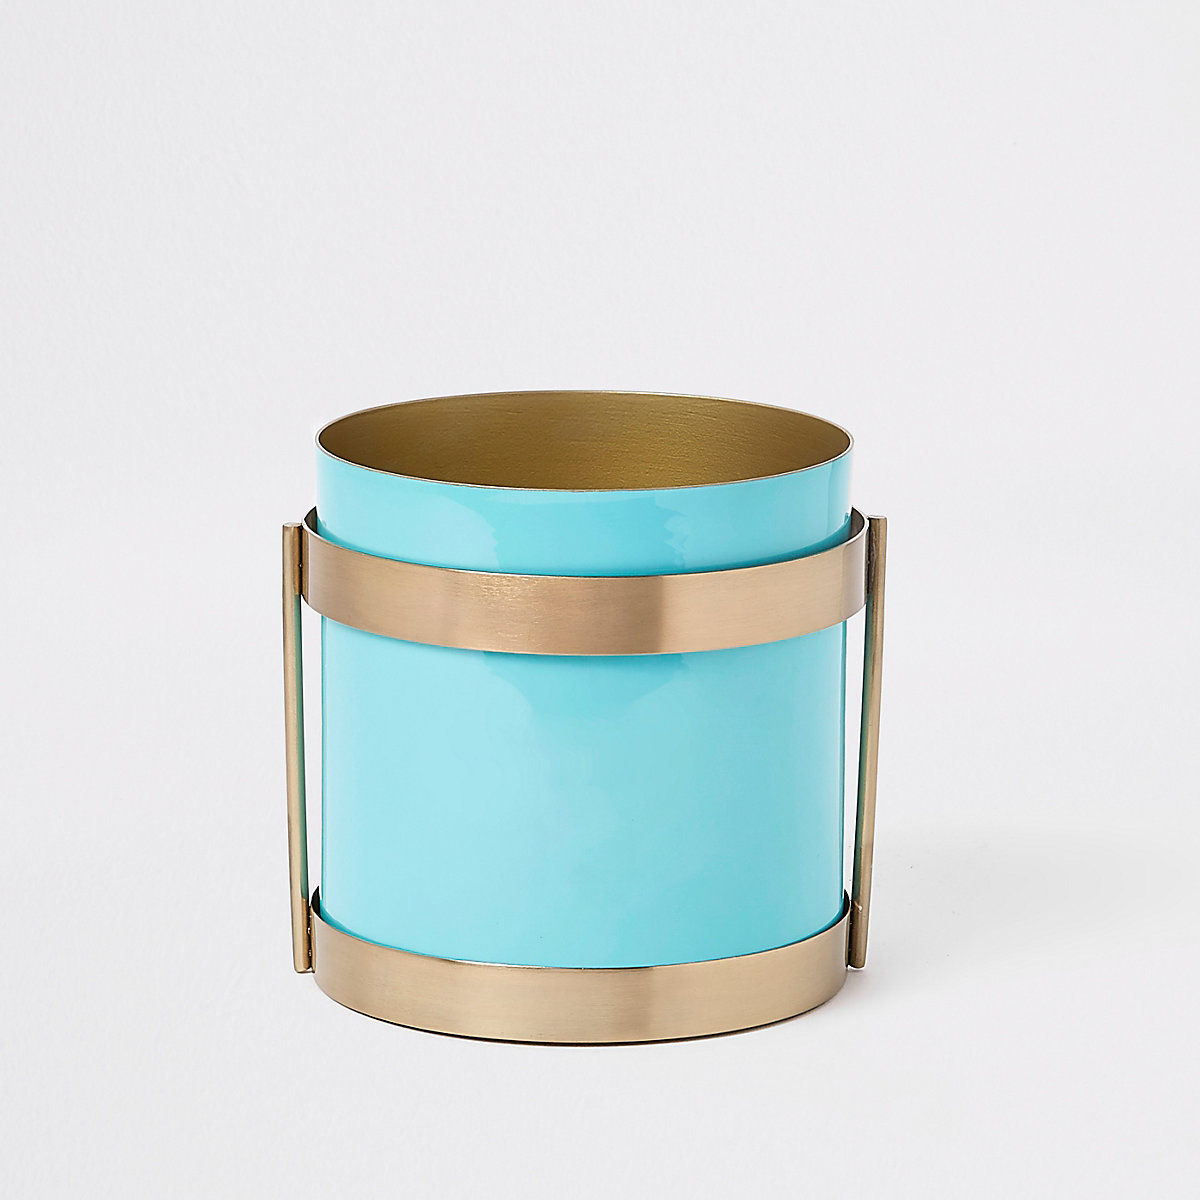 Turquoise metal planter